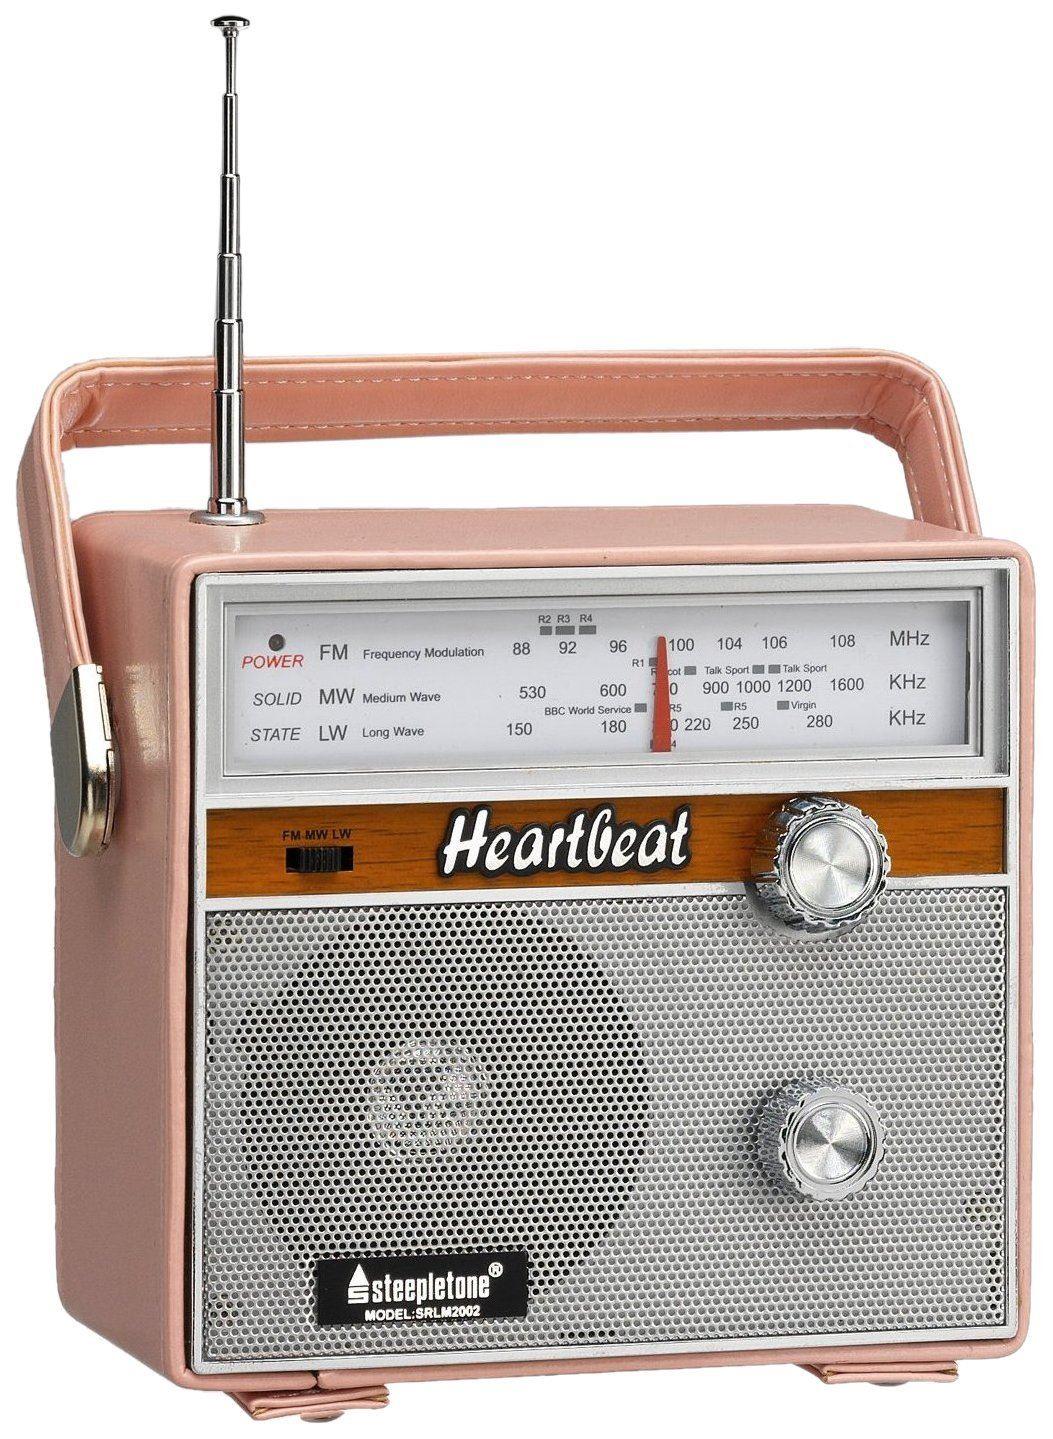 steepletone heartbeat 1960s retro style portable radio pink vintage leather ebay. Black Bedroom Furniture Sets. Home Design Ideas